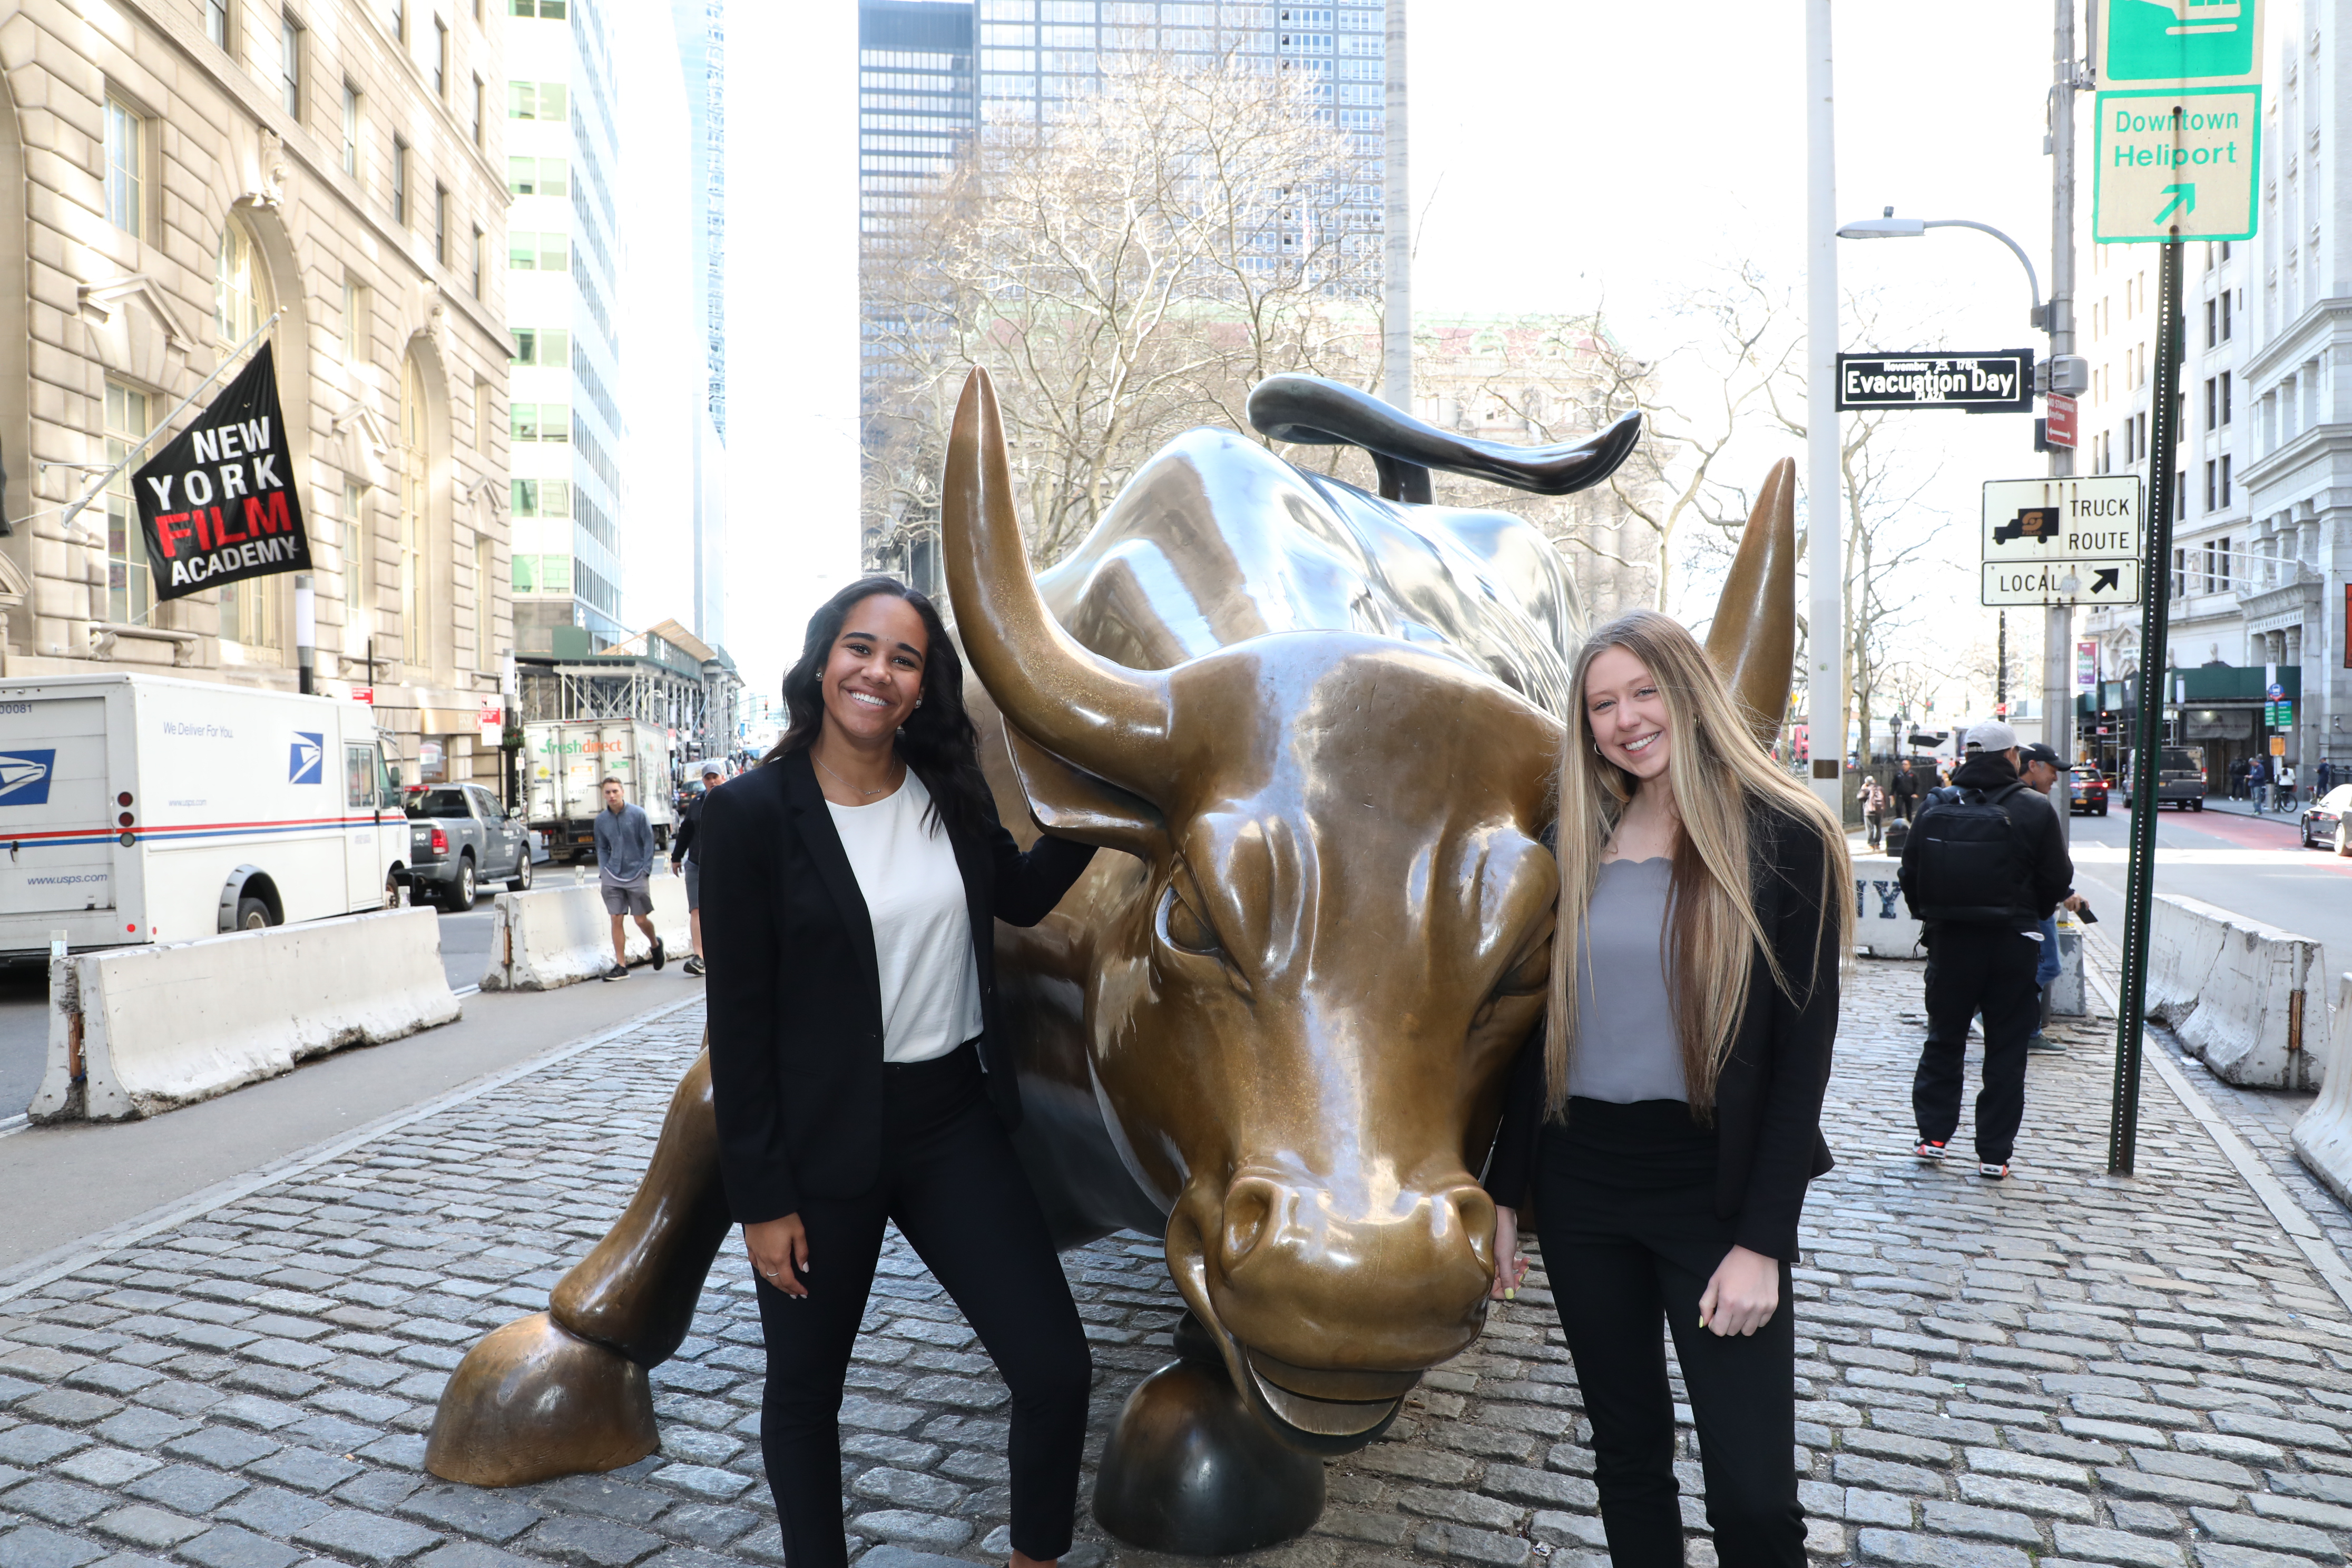 Wall Street Scholars next to the Wall Street Bull